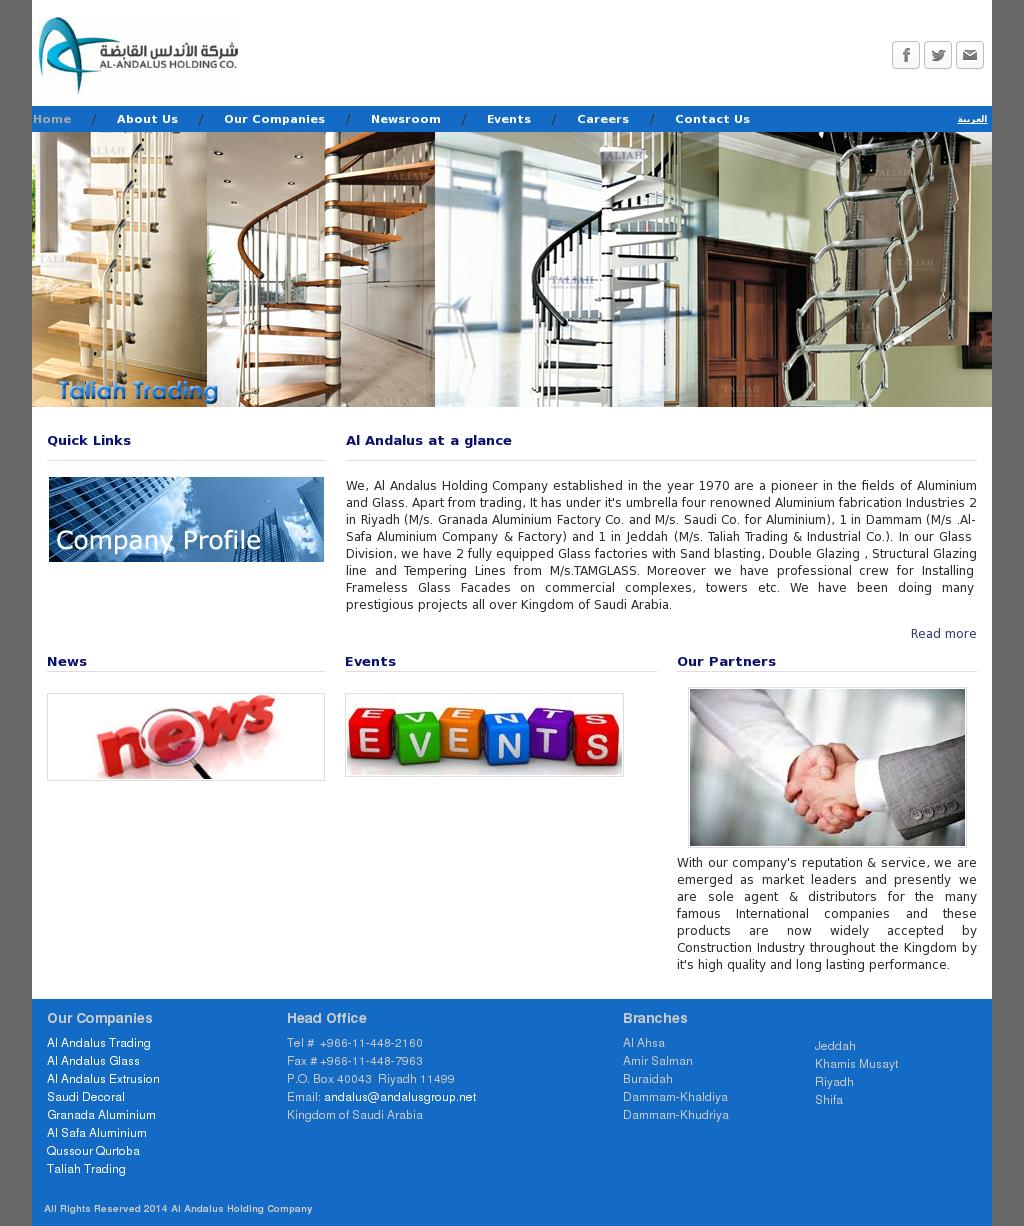 Al Andalus Holding Company Competitors, Revenue and